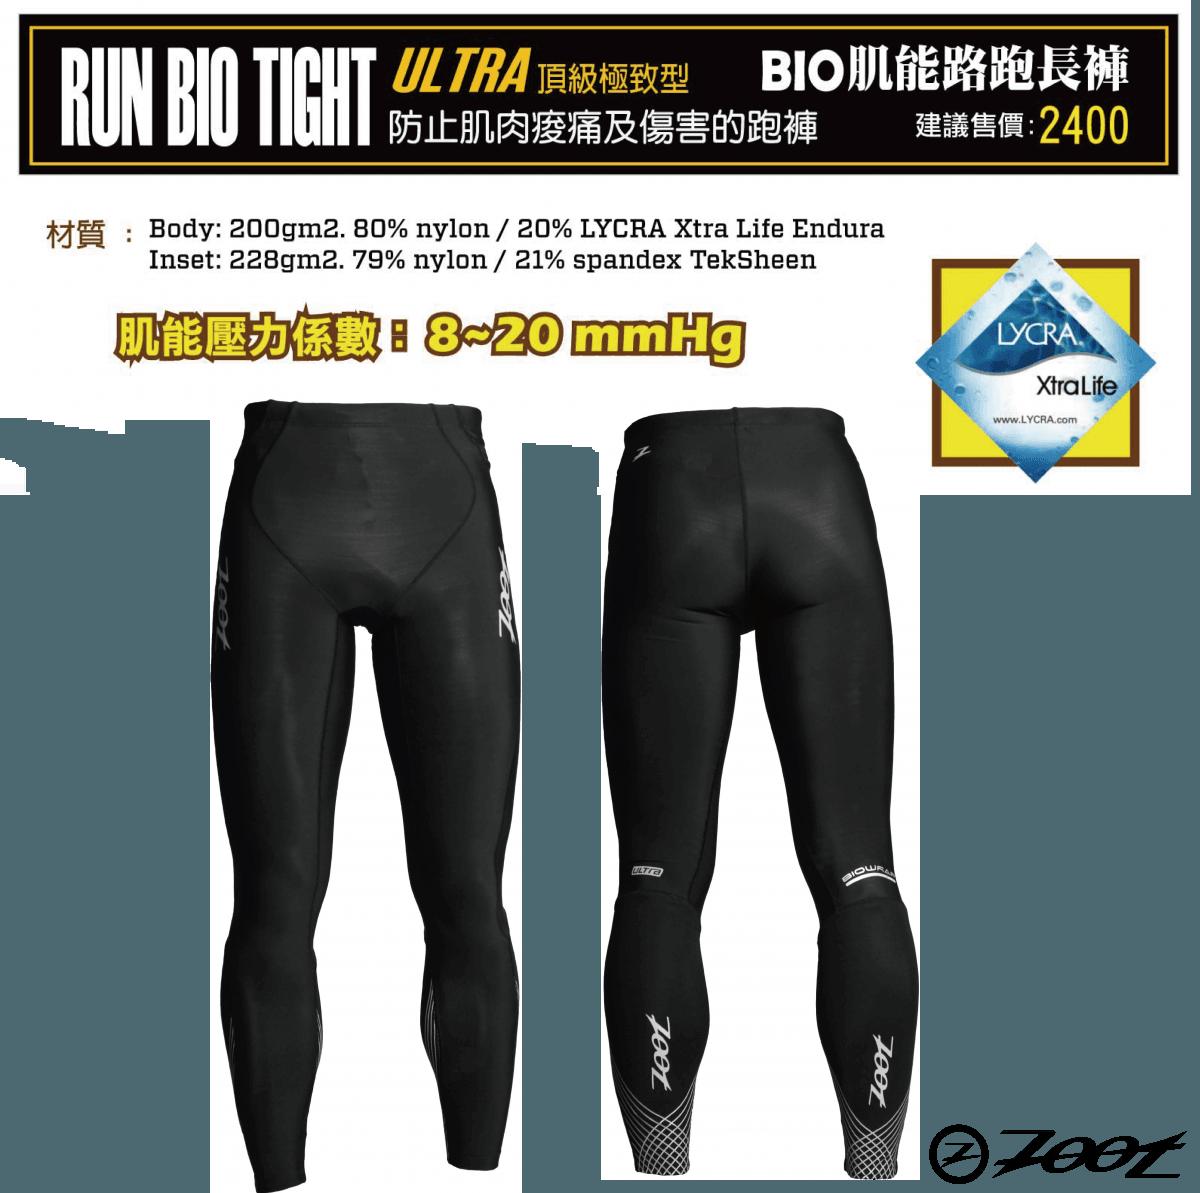 【ZOOT】 頂級萊卡BIO肌能壓縮長褲 (男) 0